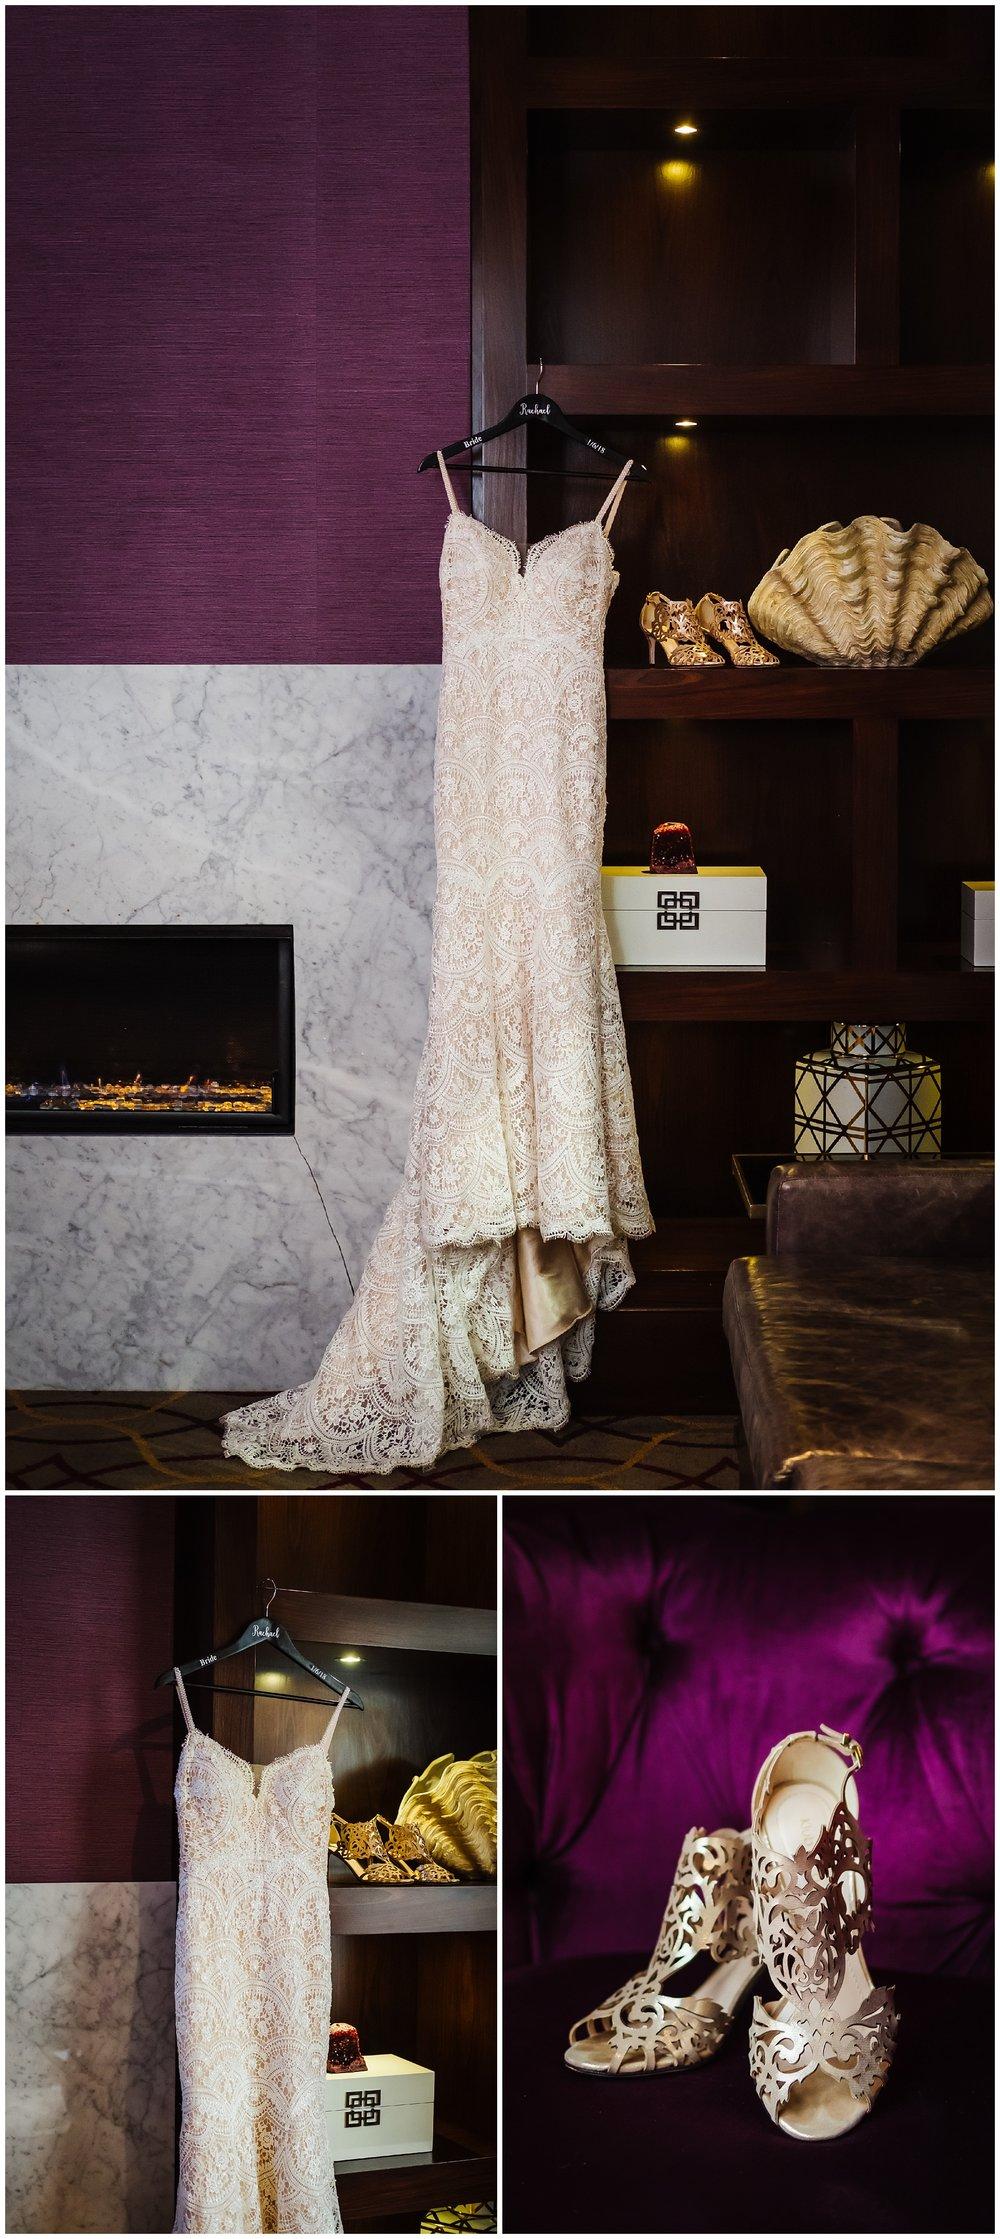 tampa-armeture-wedding-photographer-edgy-industrial-downtown-fancy-free-nursery-tattoo-burgandy-velvet_0001.jpg